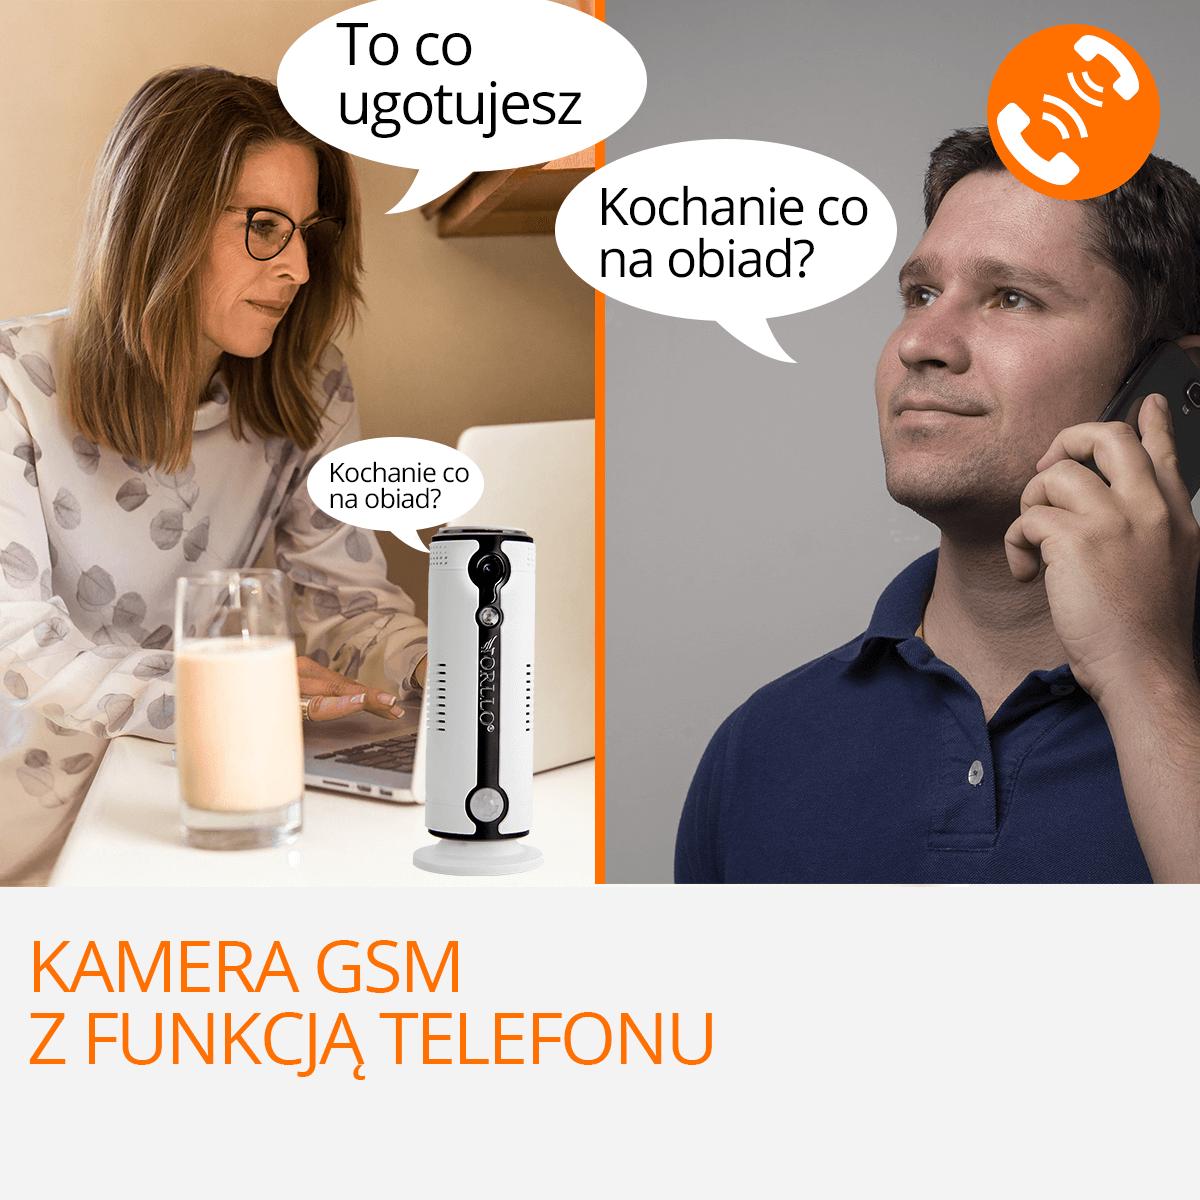 kamera na karte funkcja telefonu orllo.pl